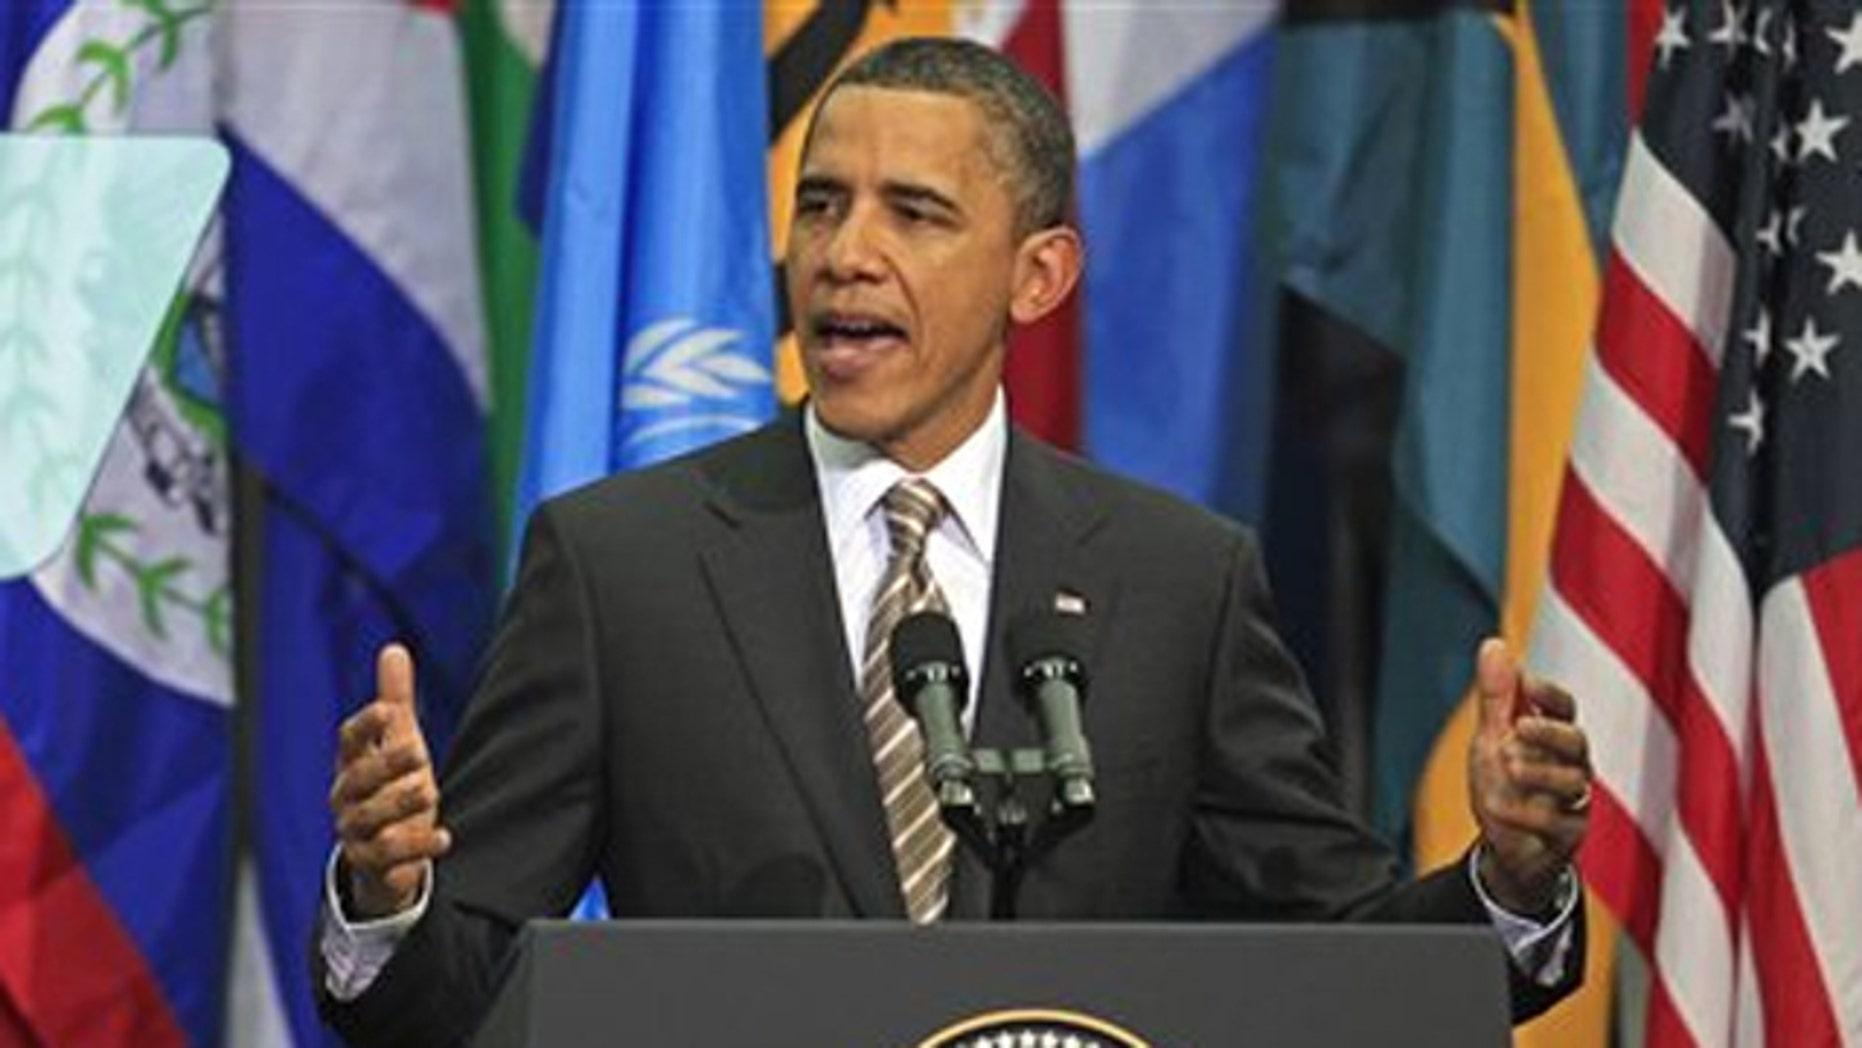 Monday: President Obama delivers a speech at Centro Cultural La Moneda Palace in Santiago, Chile.